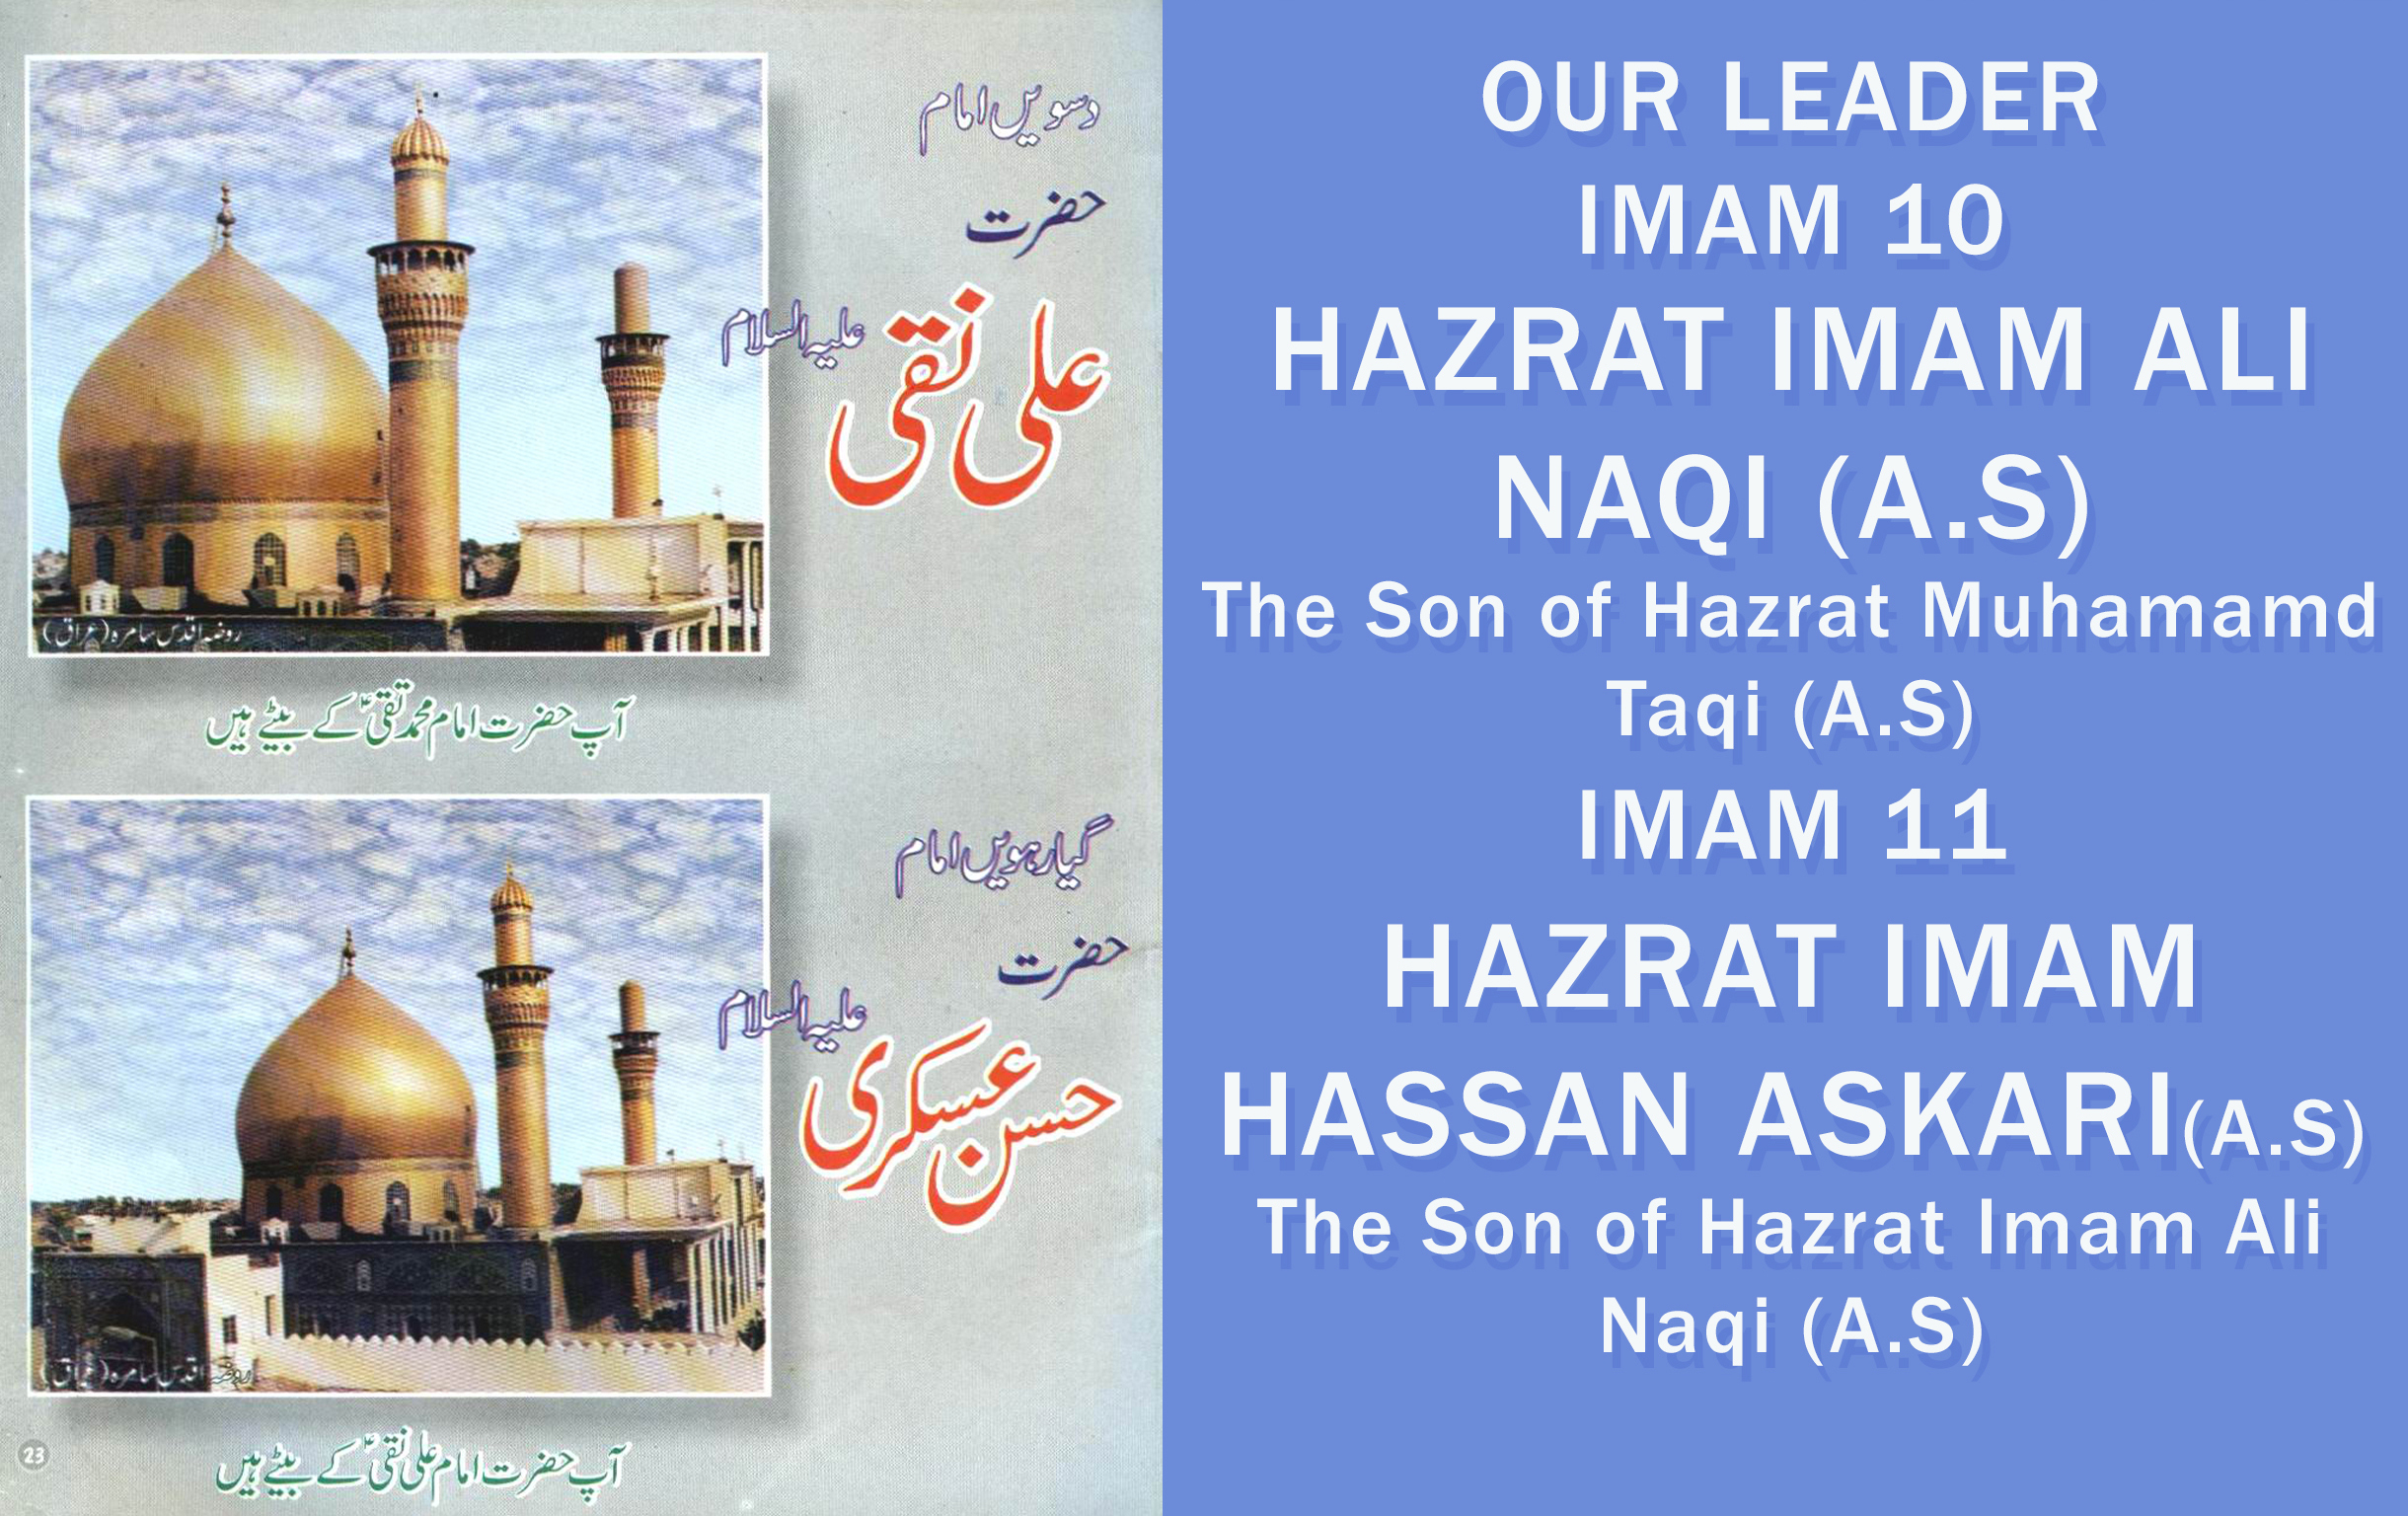 Hazrat Imam Ali Naqi A.S / Hazrat Imam Hassan Askari A.S